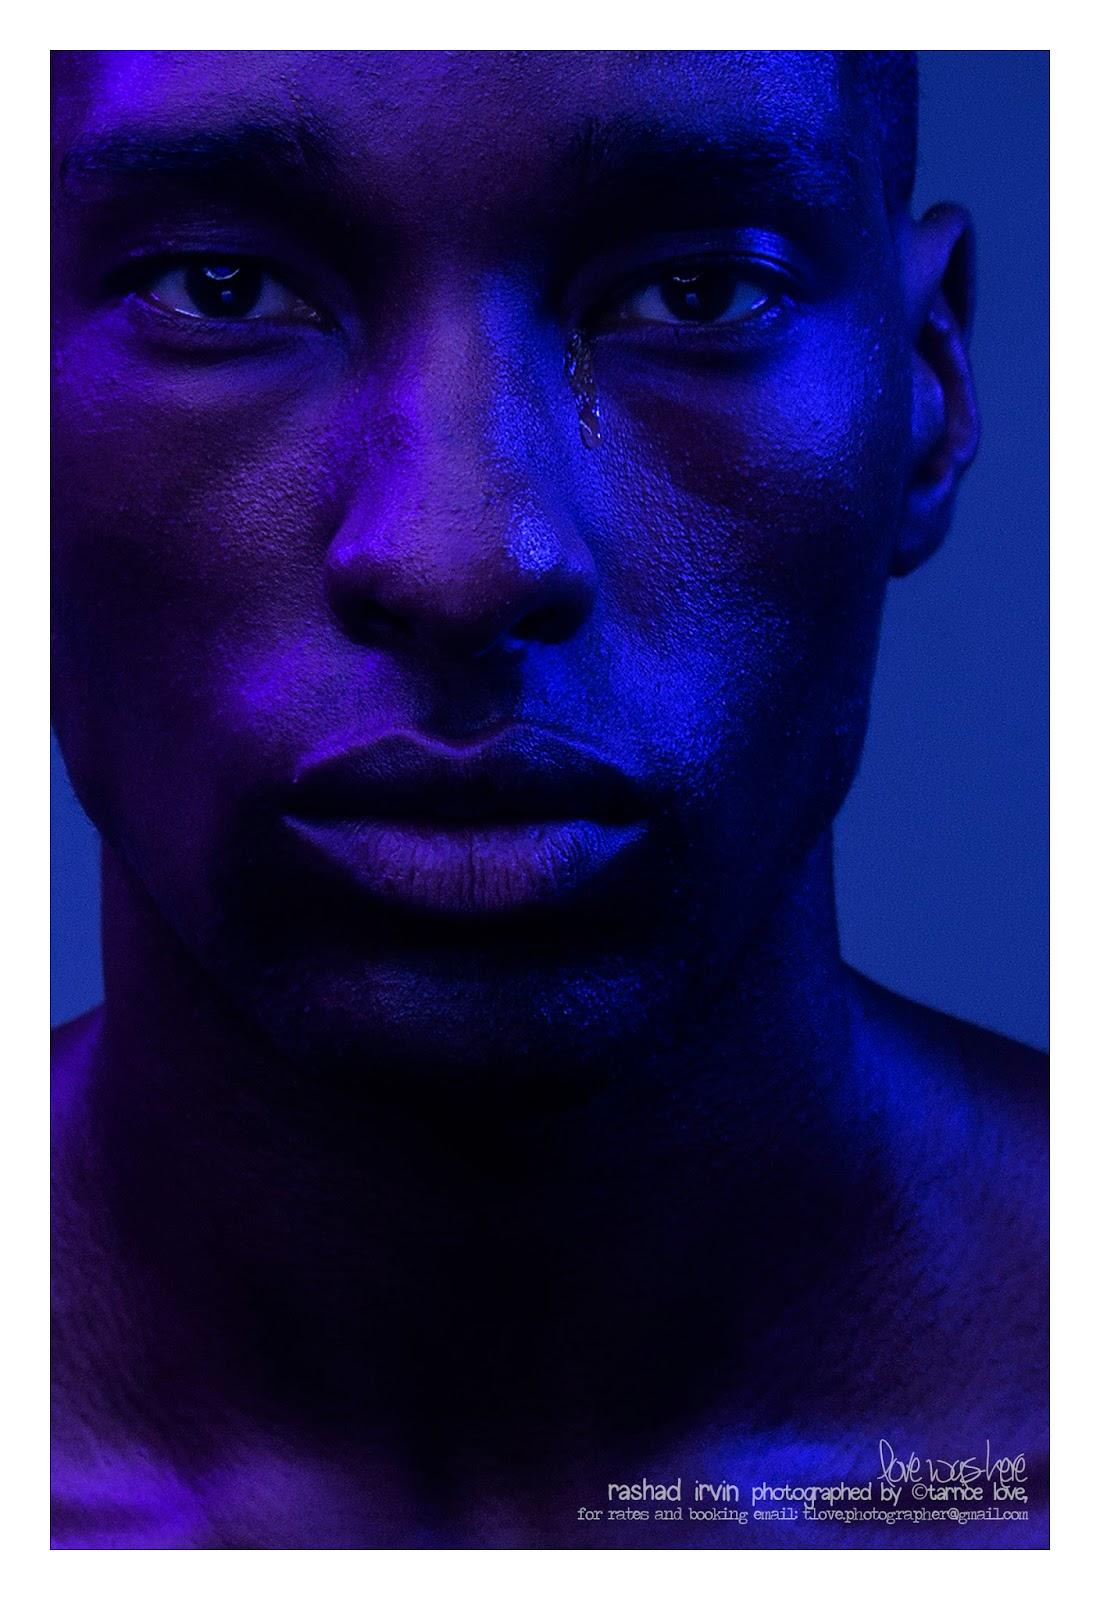 in moonlight black boys look blue play